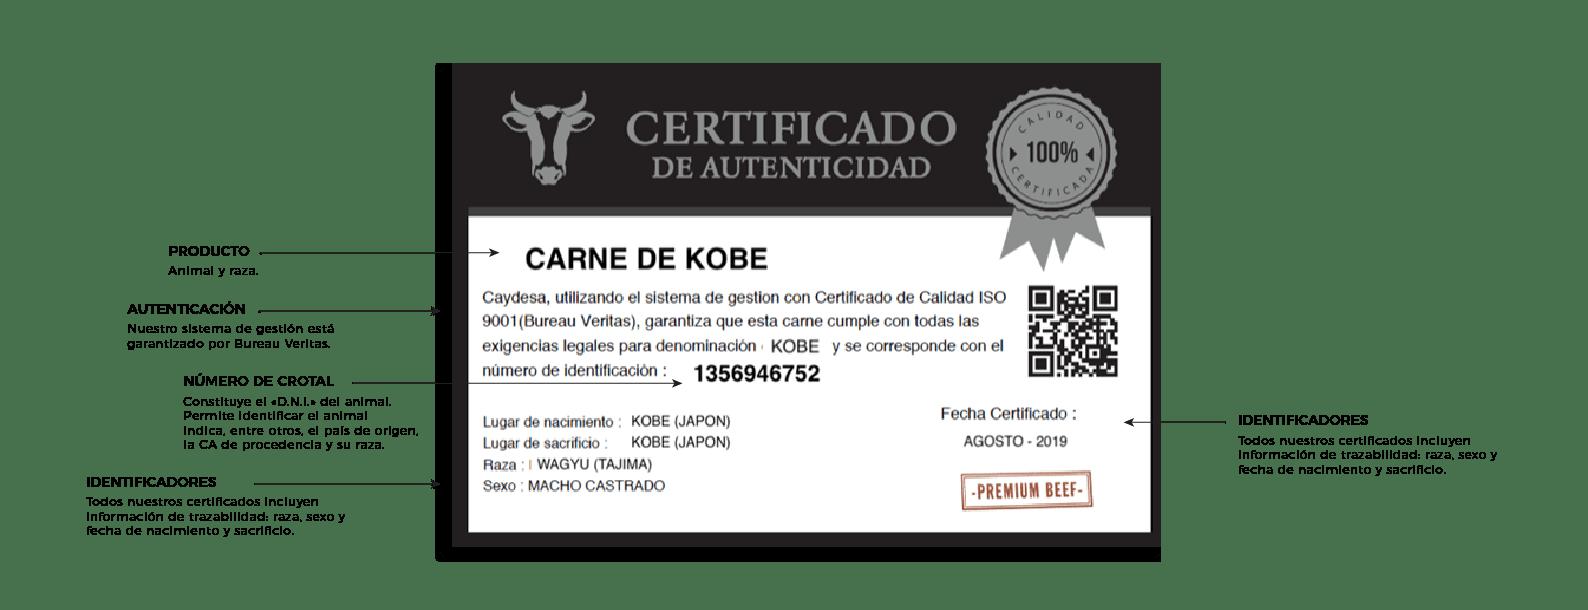 carne de kobe certificada